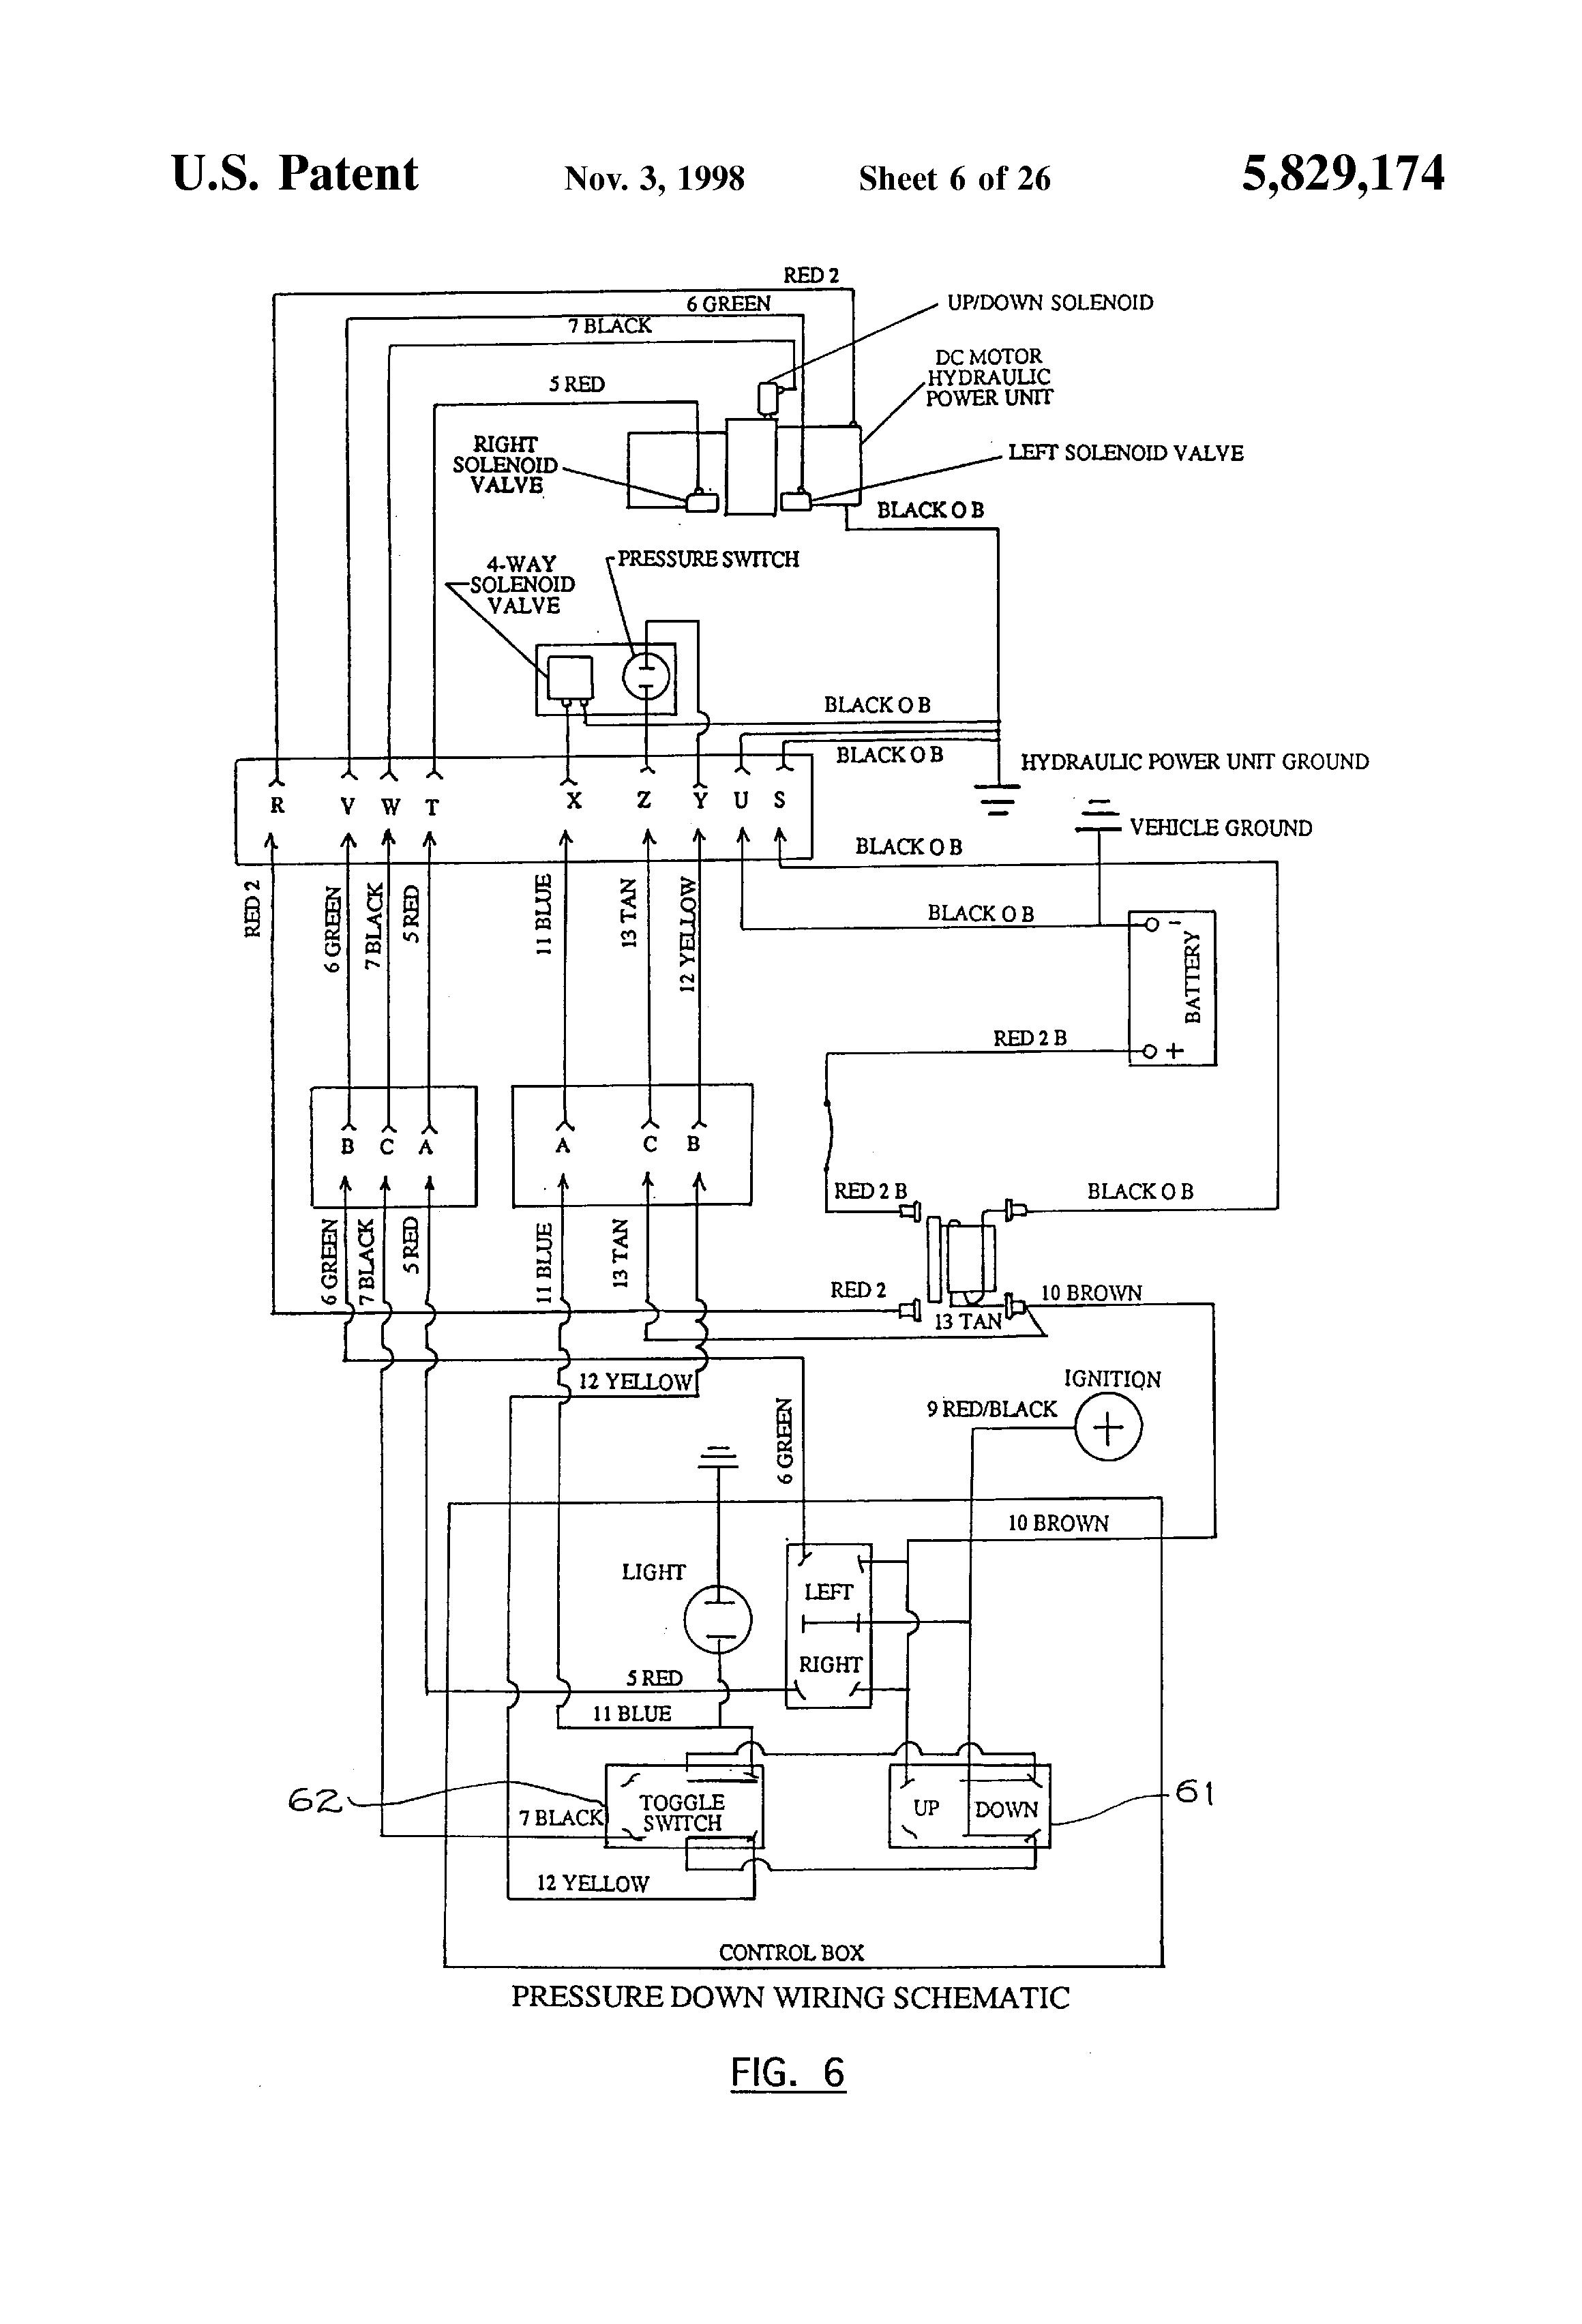 Snow Plow Pump Wiring Diagram. Snow Way Plow Parts Diagram ... Haldex Plow Wiring Diagram on meyer plow diagram, plow switches diagram, plow hydraulic diagram, plow parts diagram, plow wheels, plow design diagram, plow relay diagram,